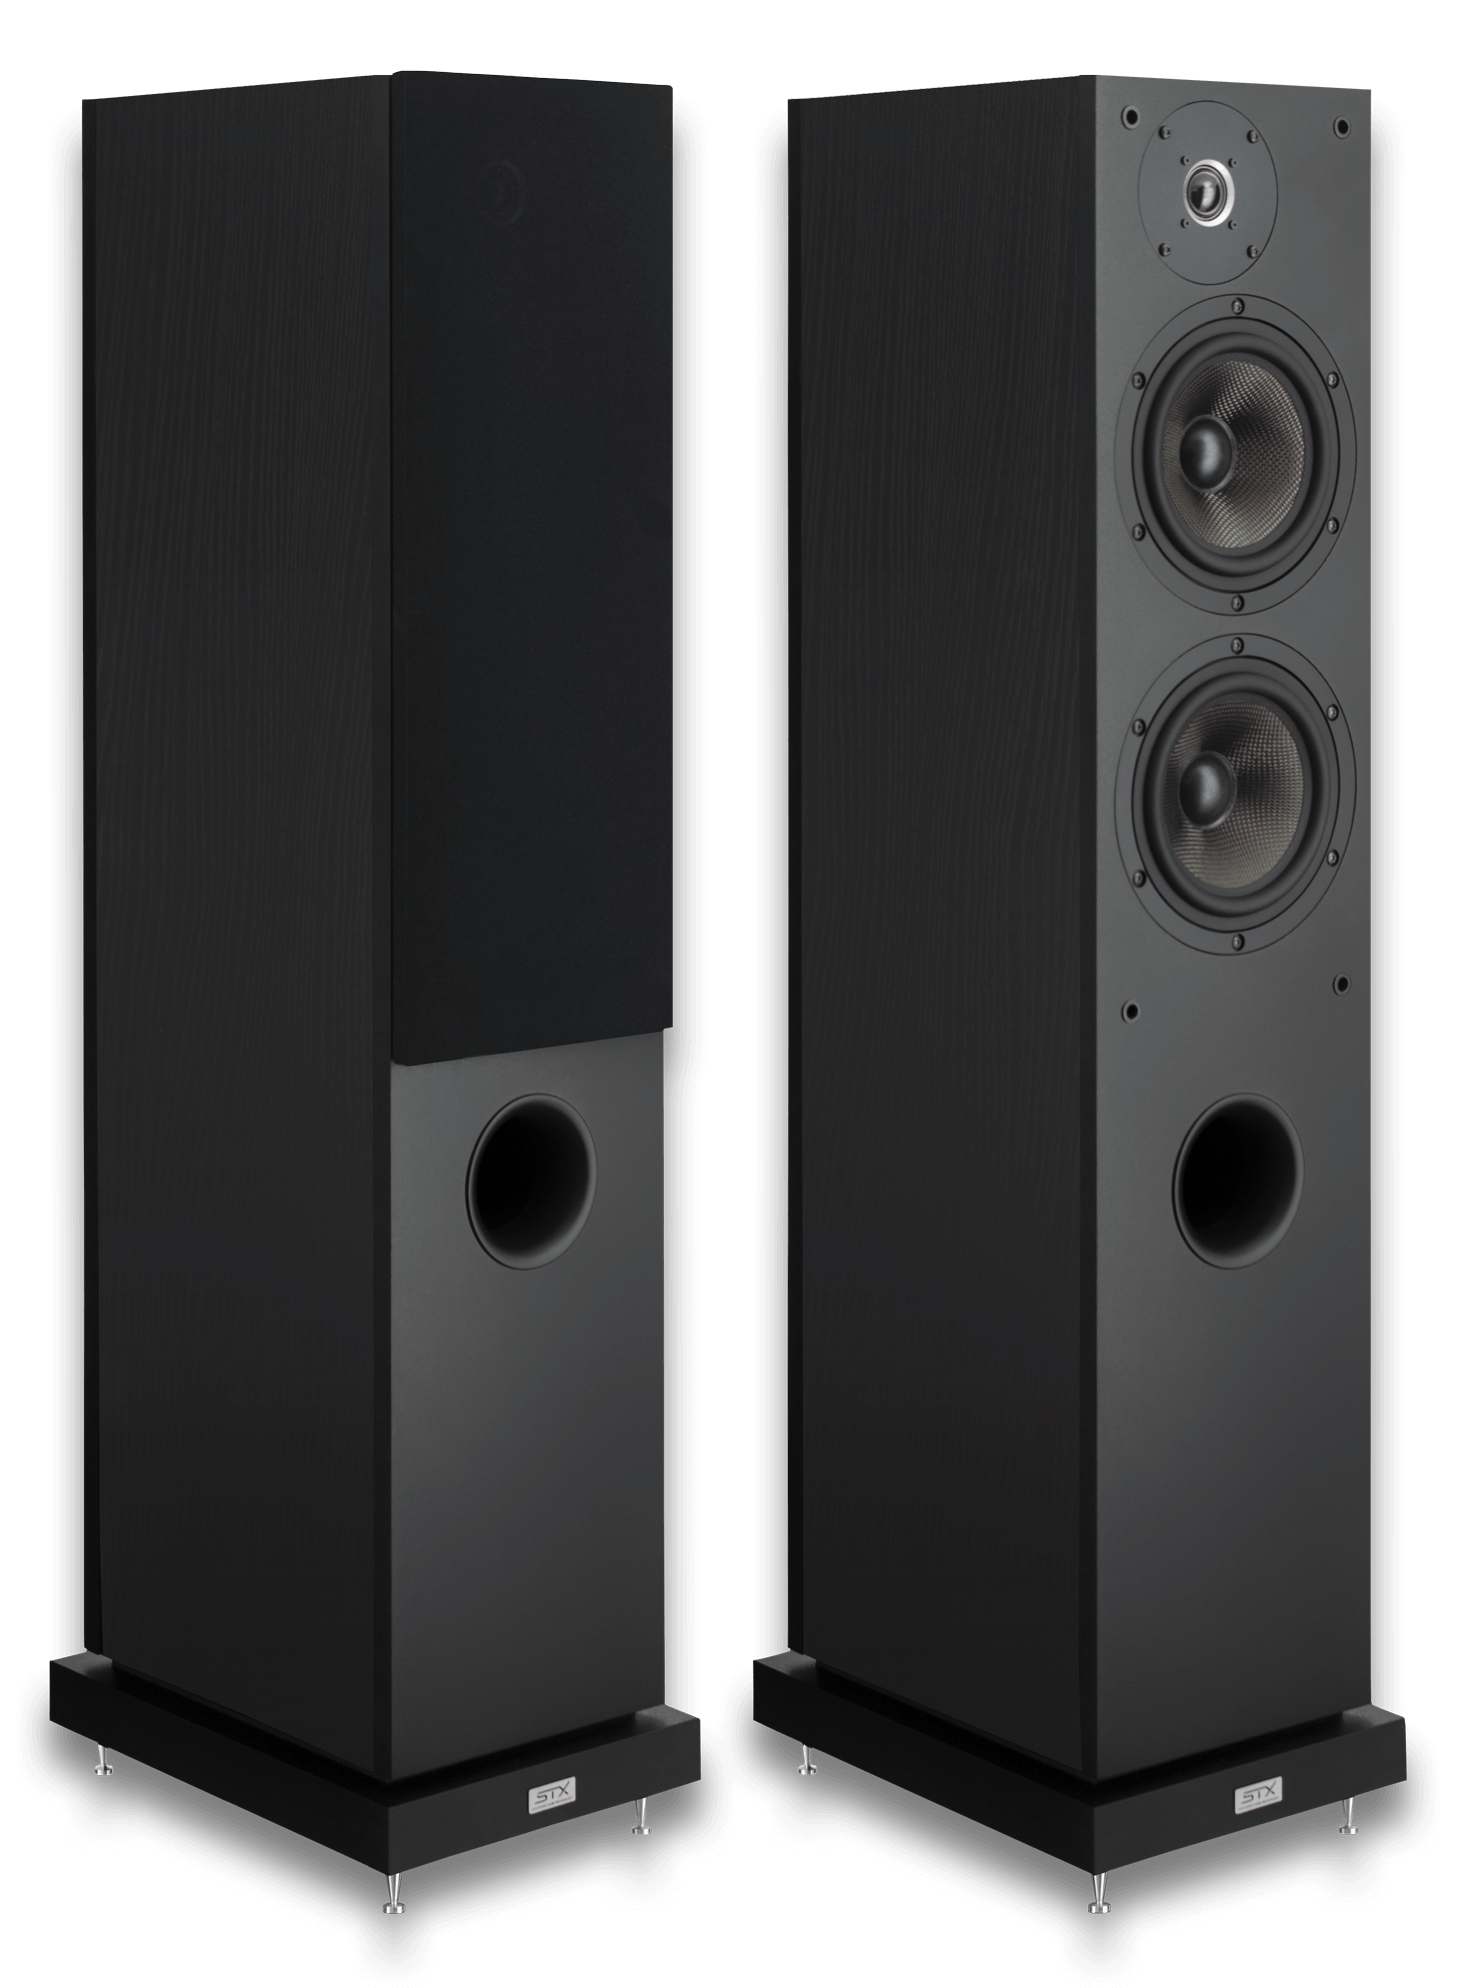 STX FX-300 czarne